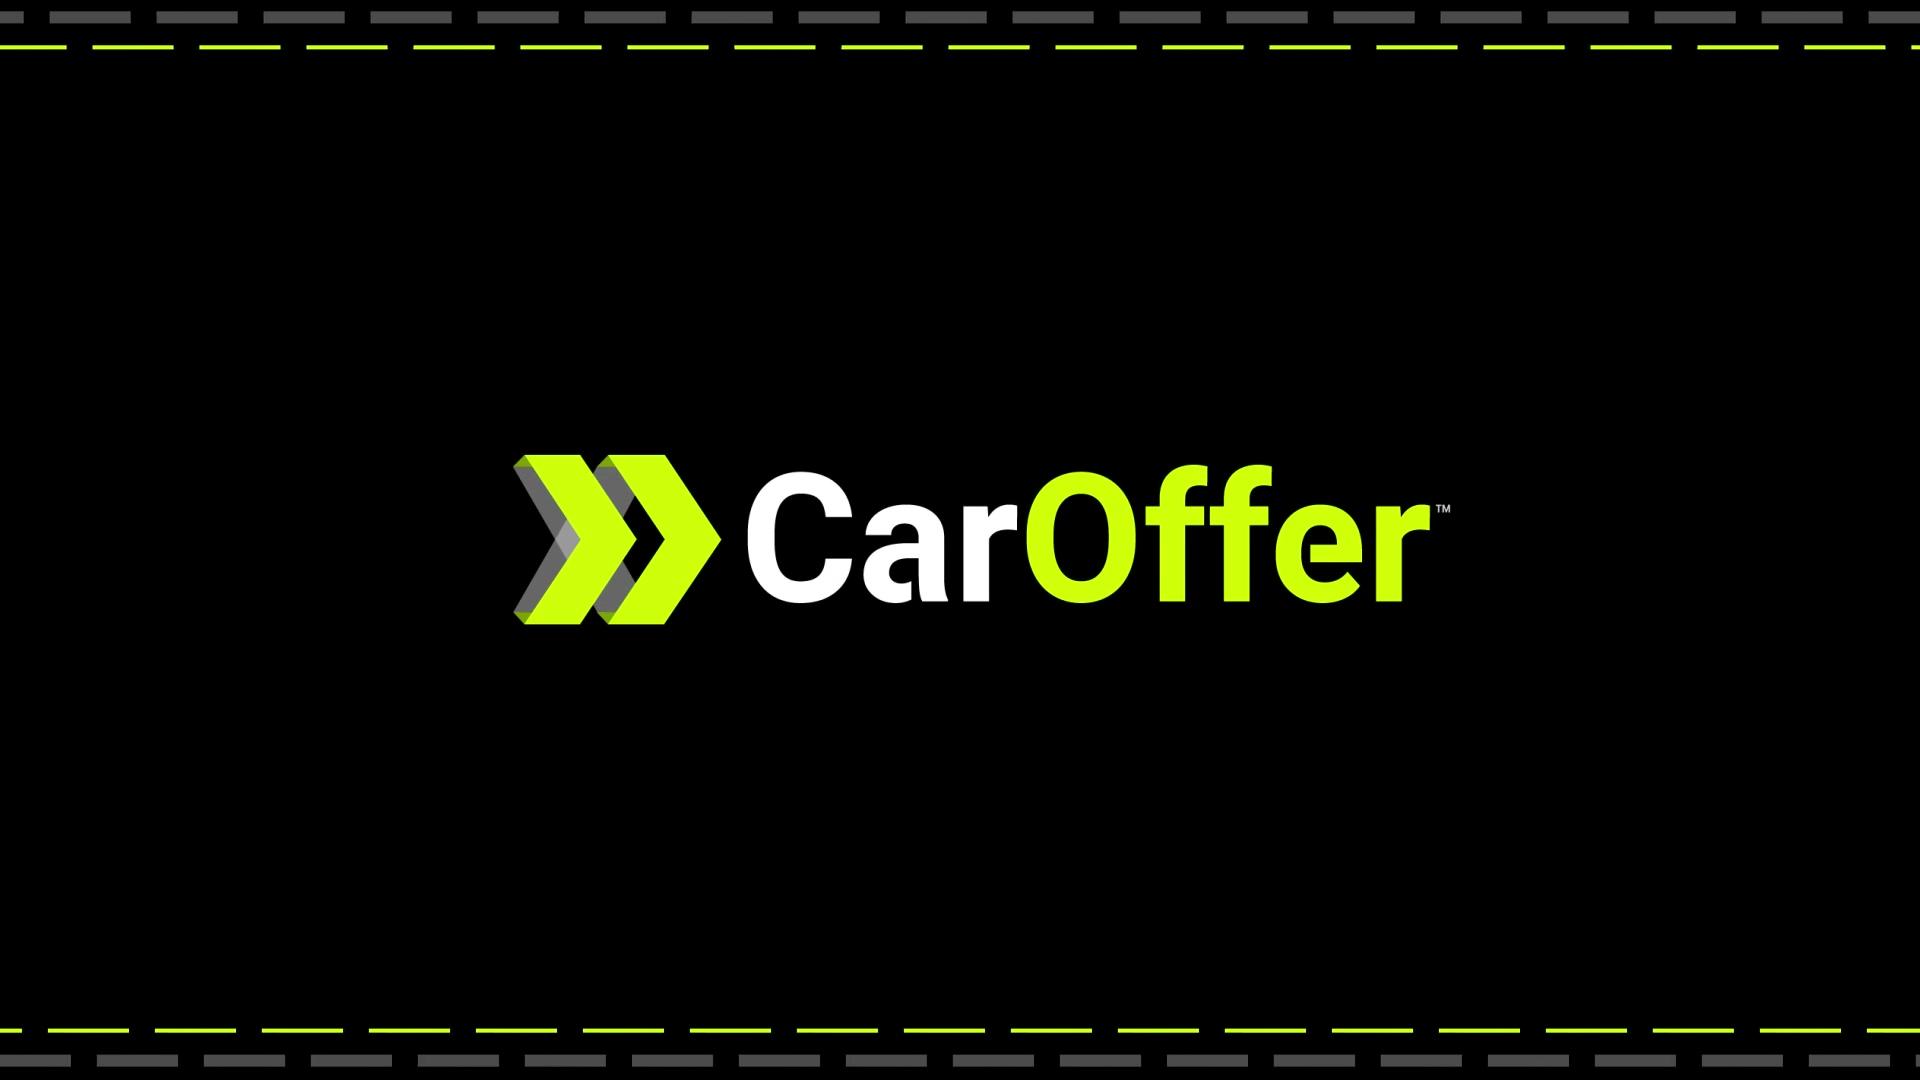 CarOffer - How It Works